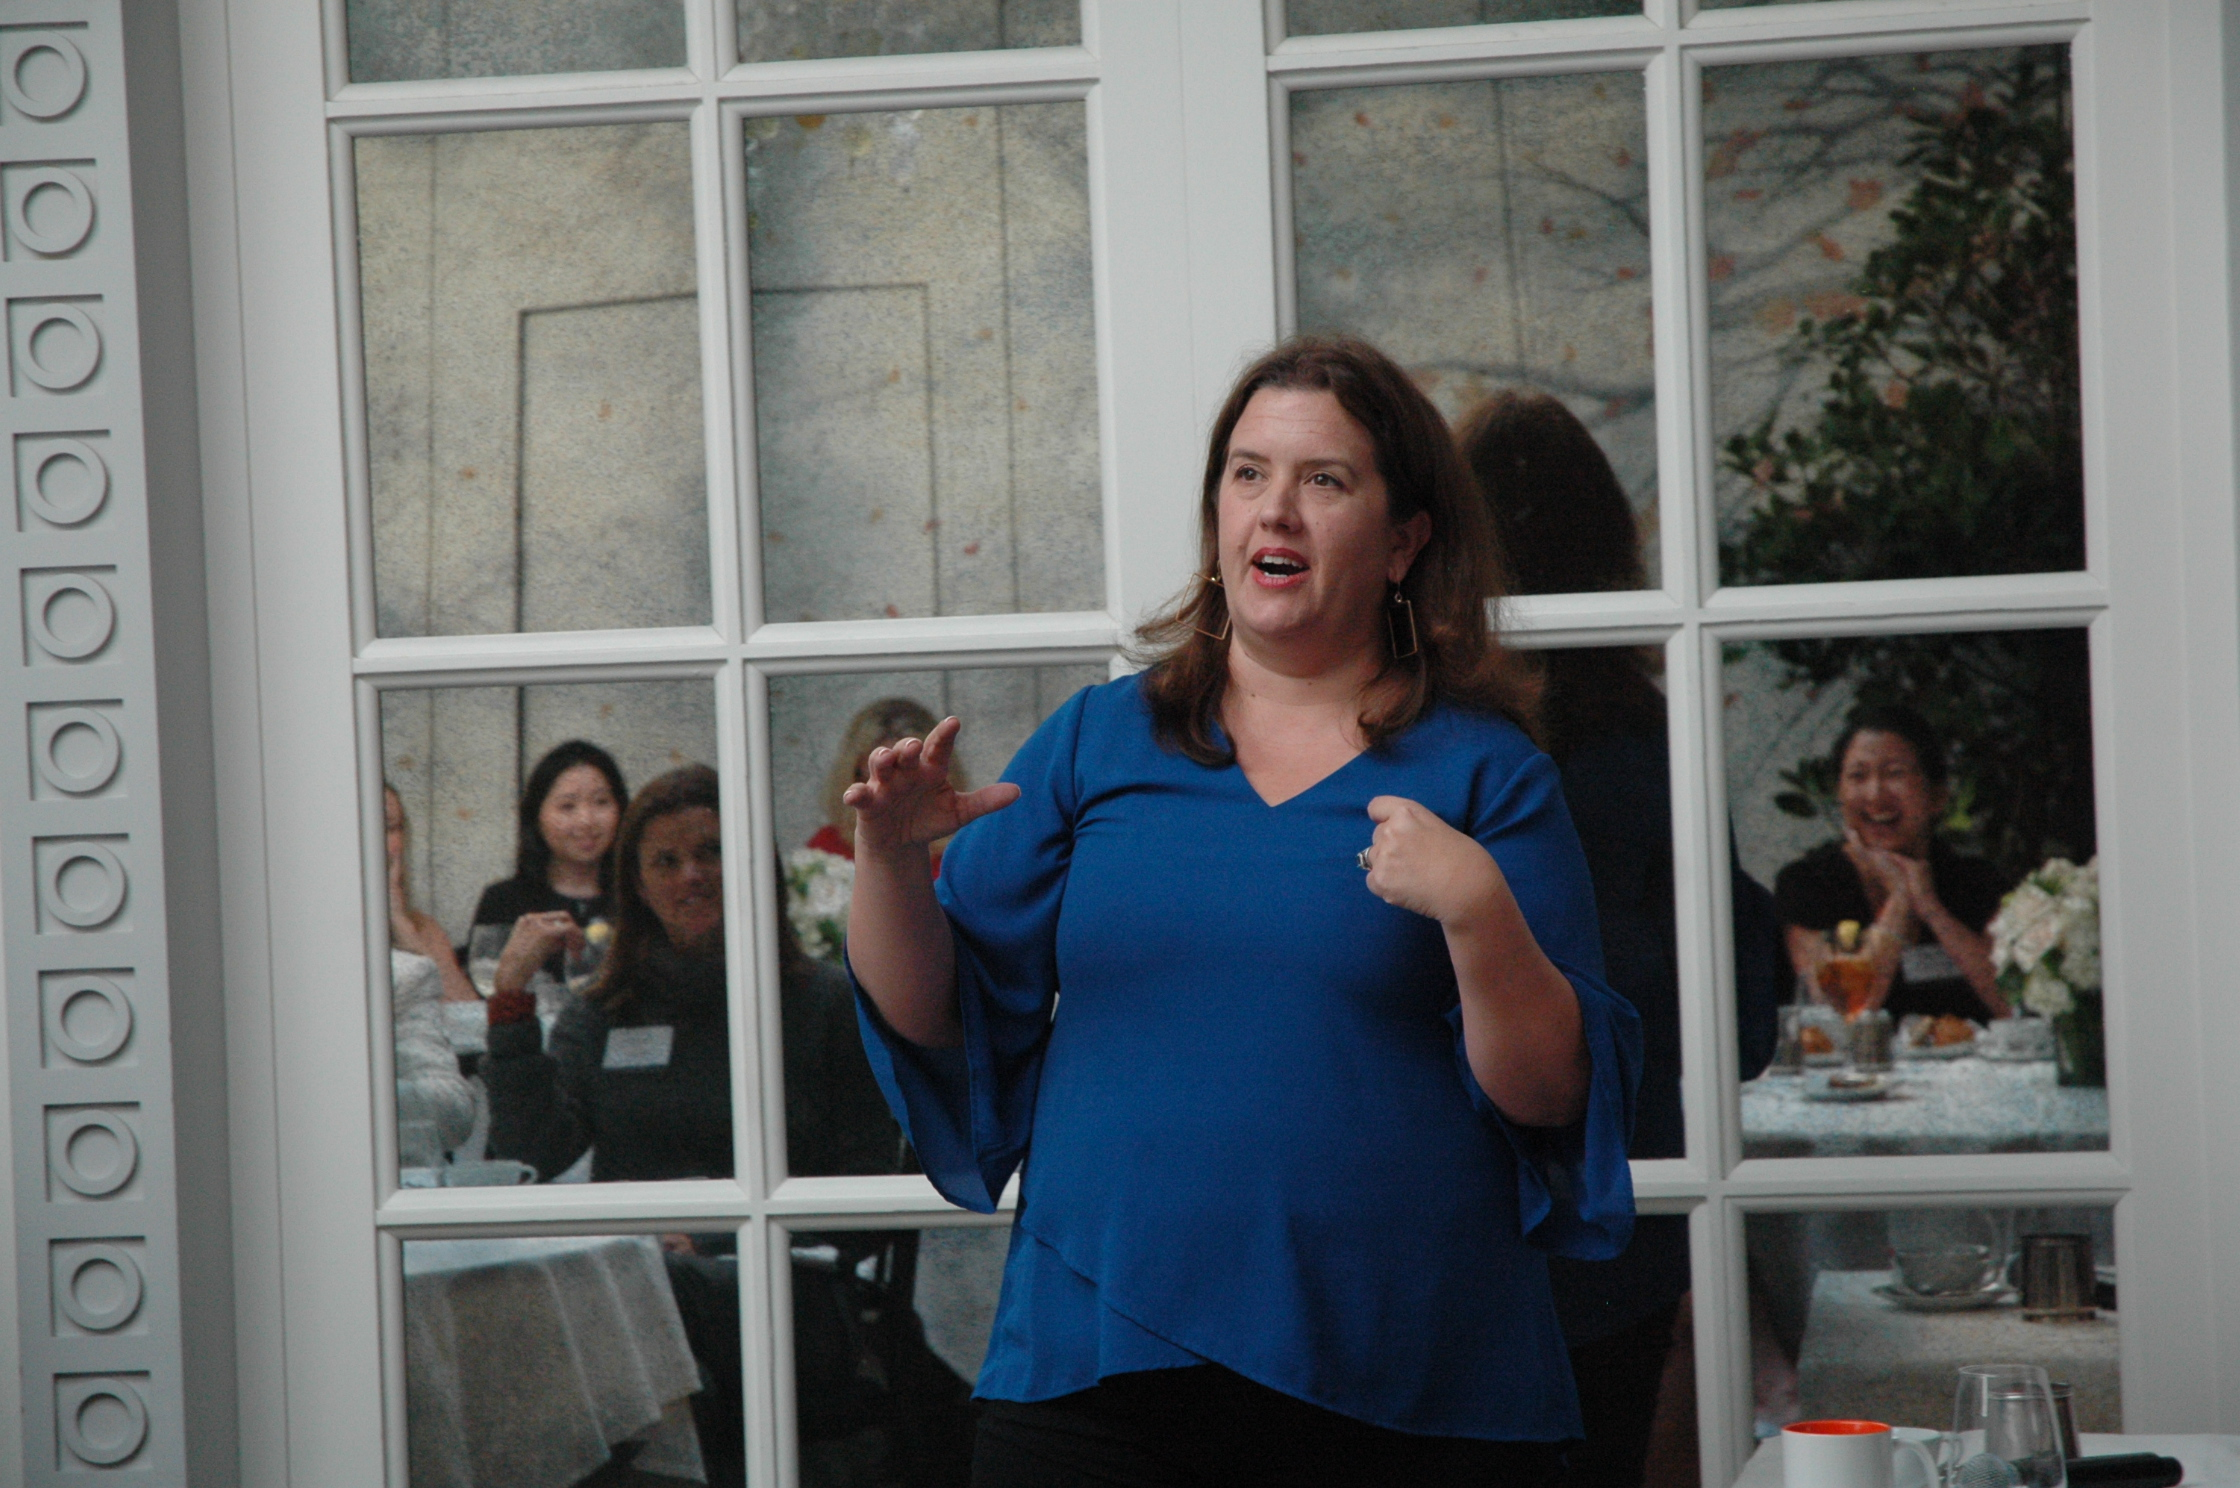 January 2018 - Joanna Bloor, Ladybadassery, Inspirationalist and TED Speaker